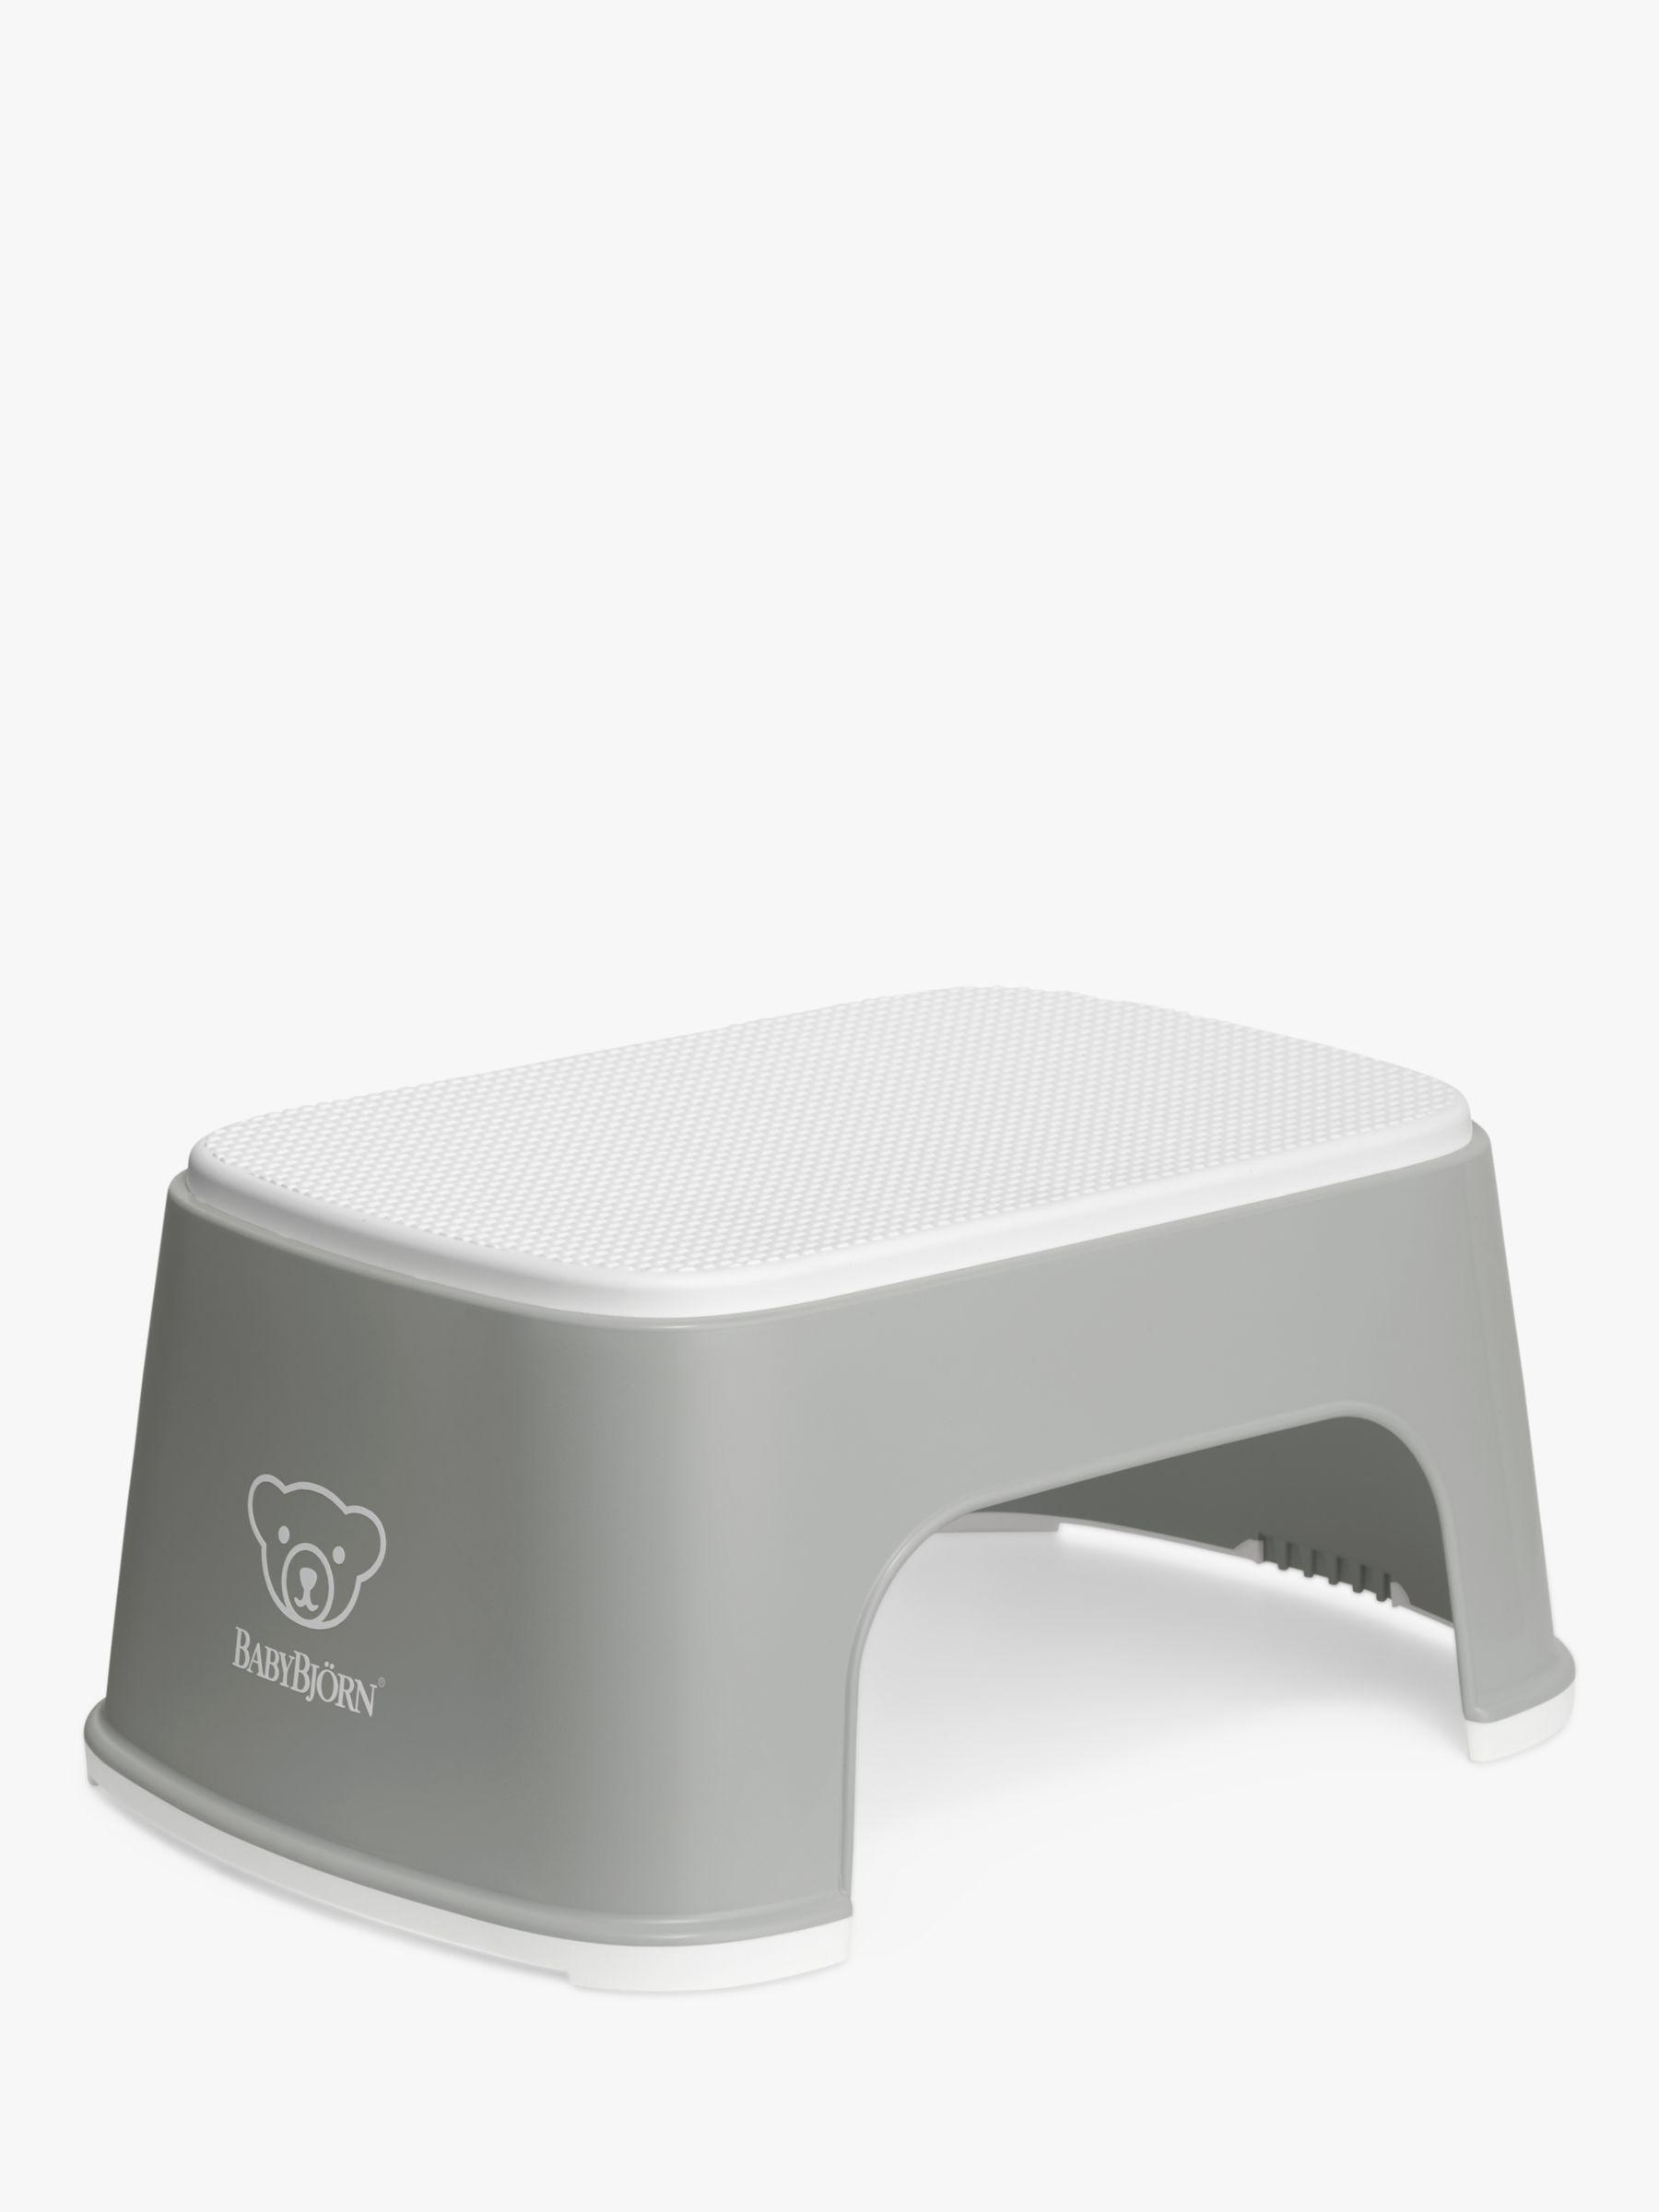 BabyBjorn BabyBjörn Toilet Training Step Stool, Grey/ White Trim